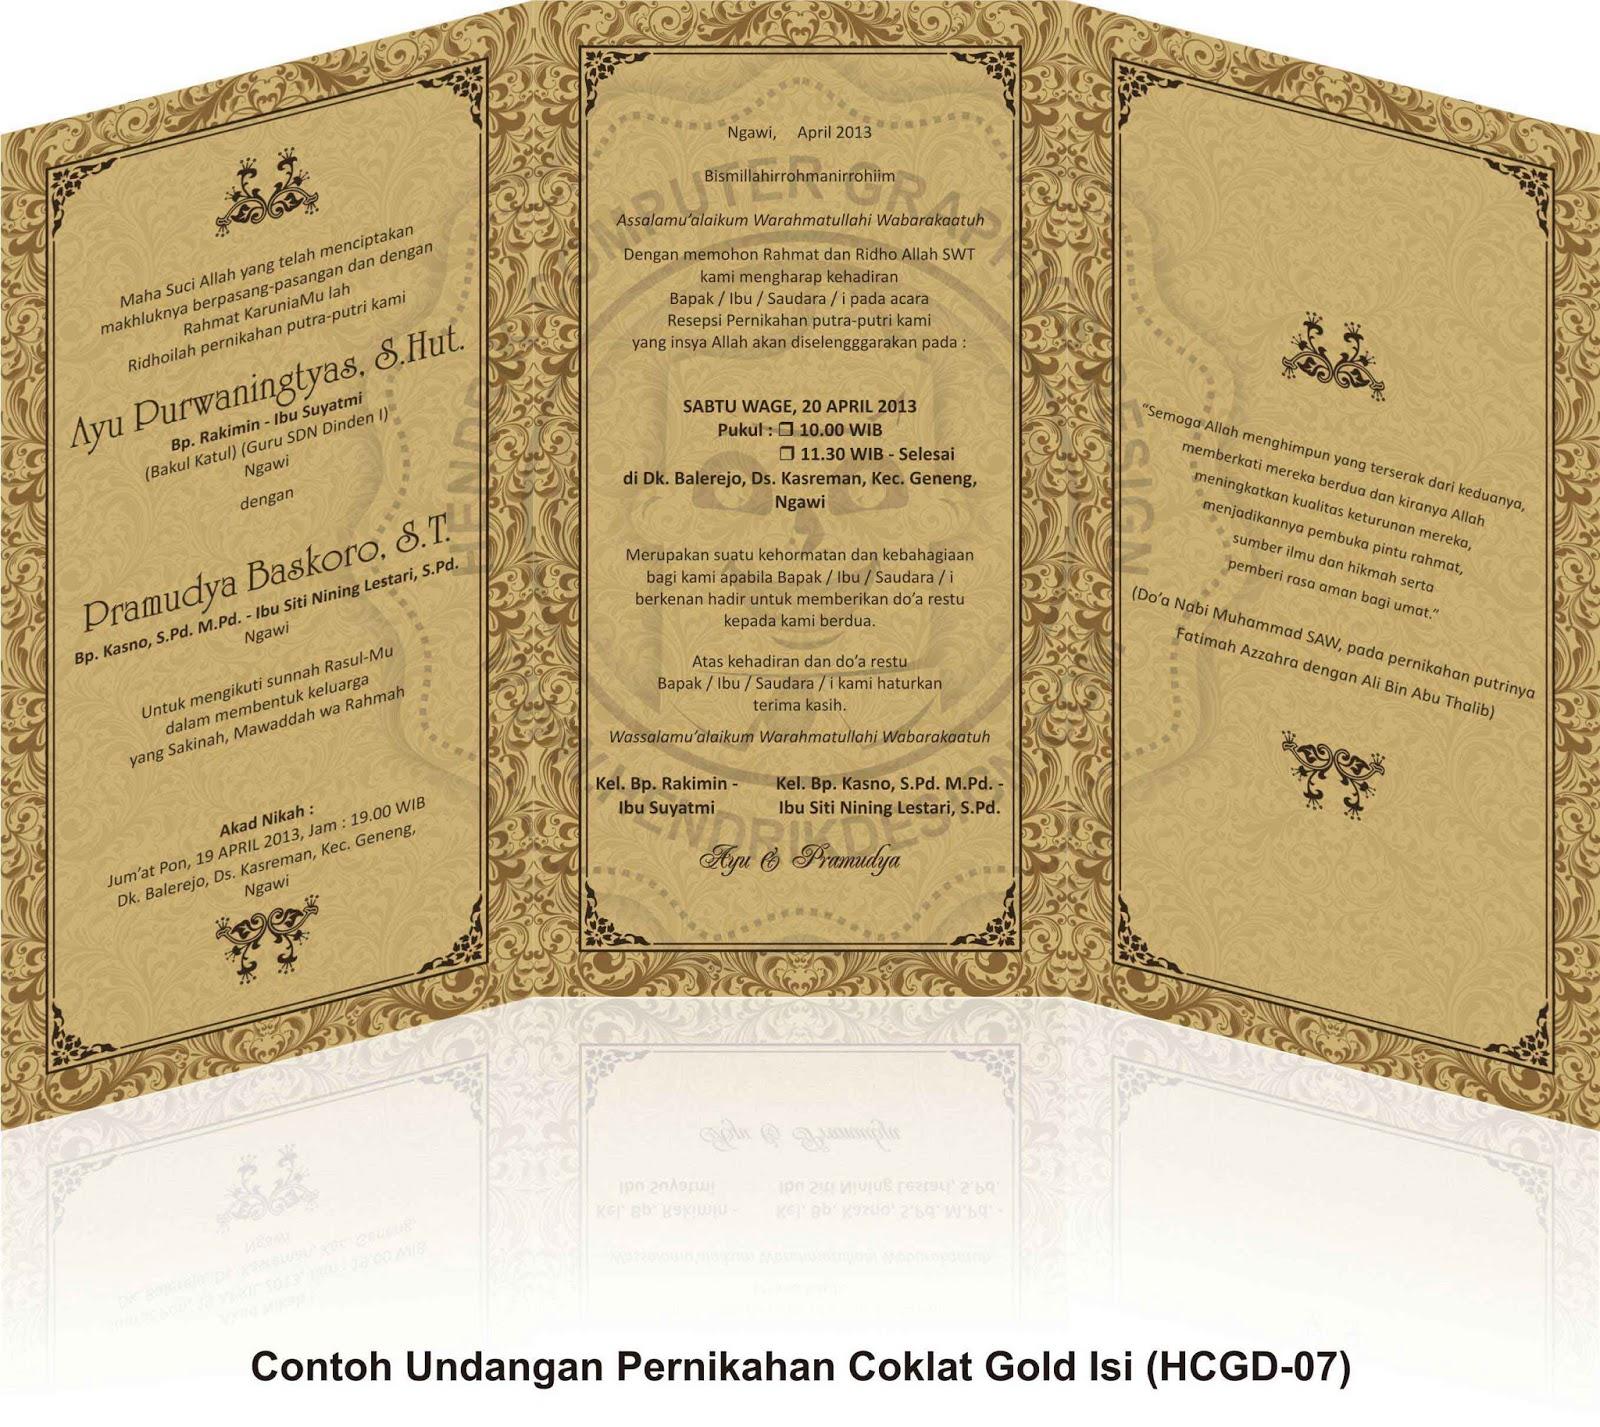 Contoh Undangan Pernikahan Coklat Gold Hcgd 07 Online Shopping